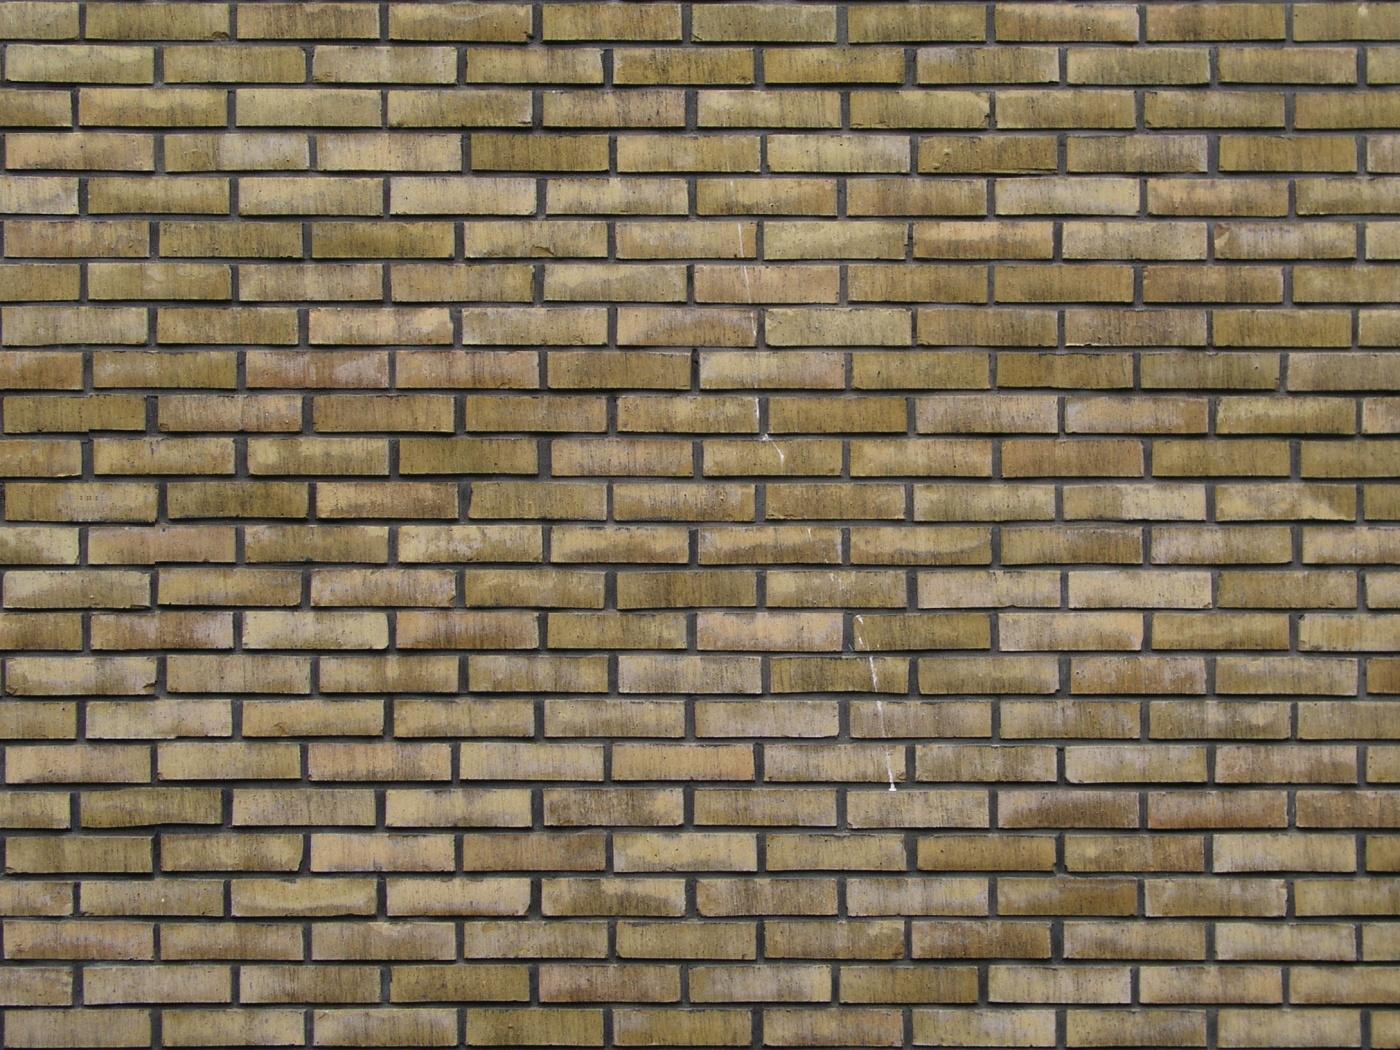 bricks, texture, wall decorative brick , download background, texture, brick texture